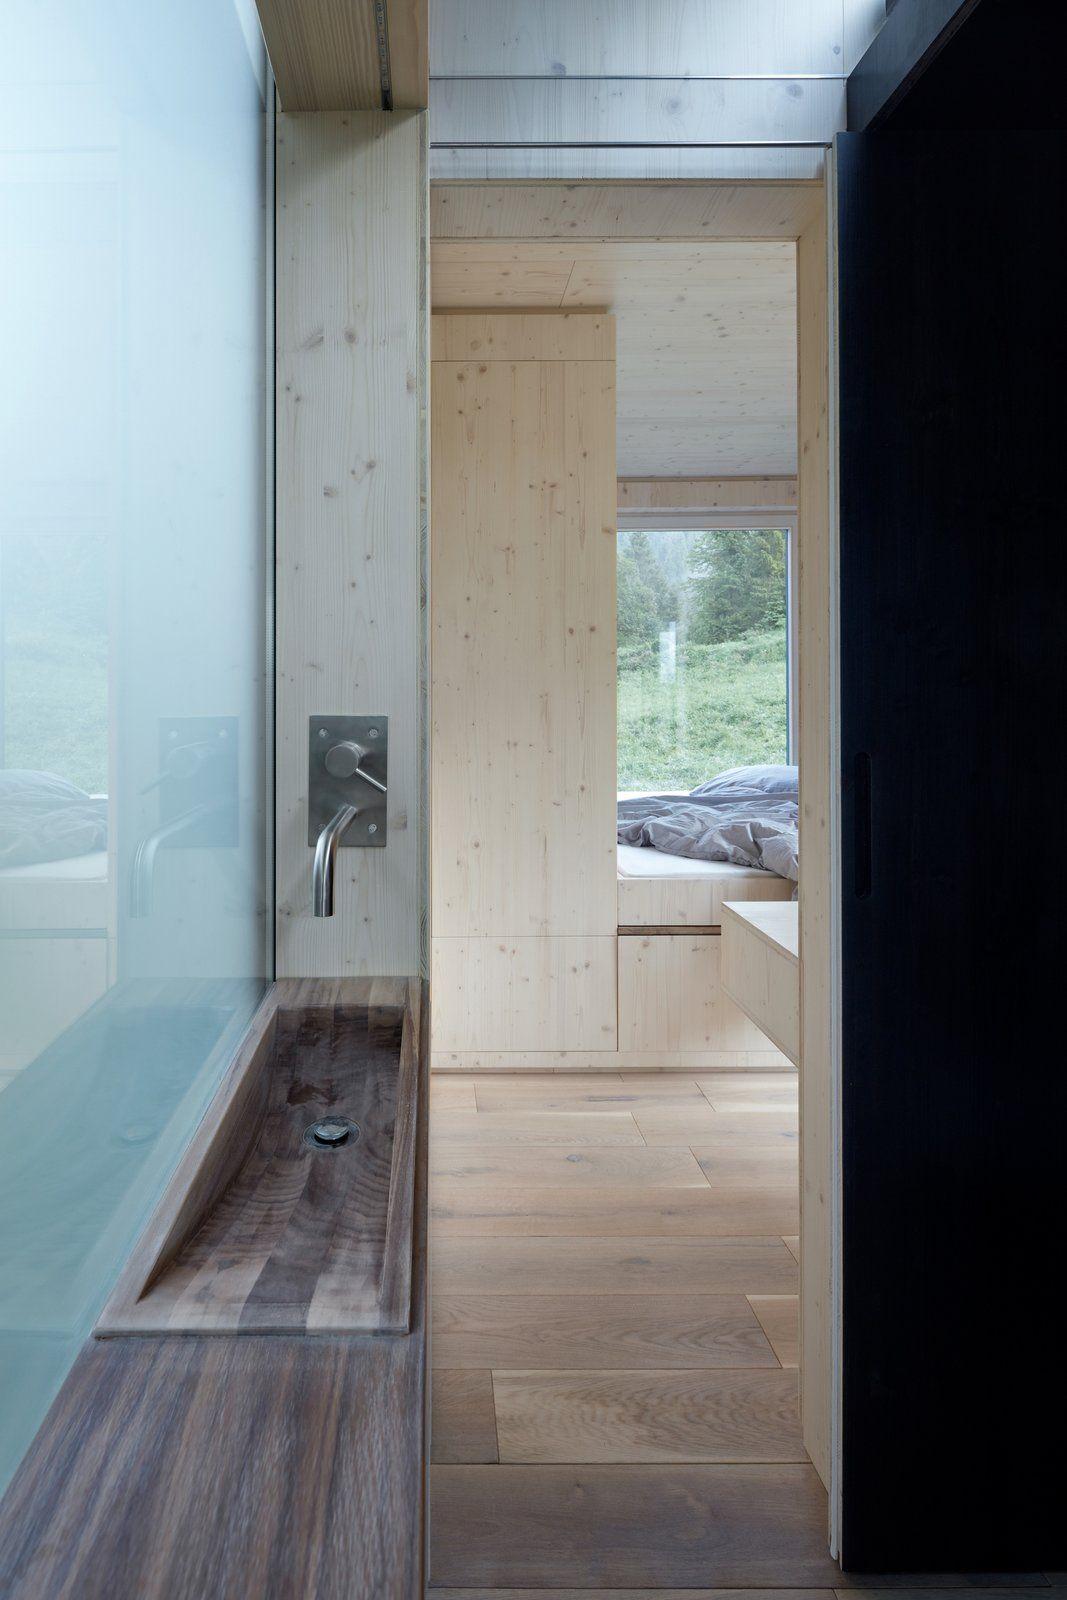 A small walnut washbasin is built into